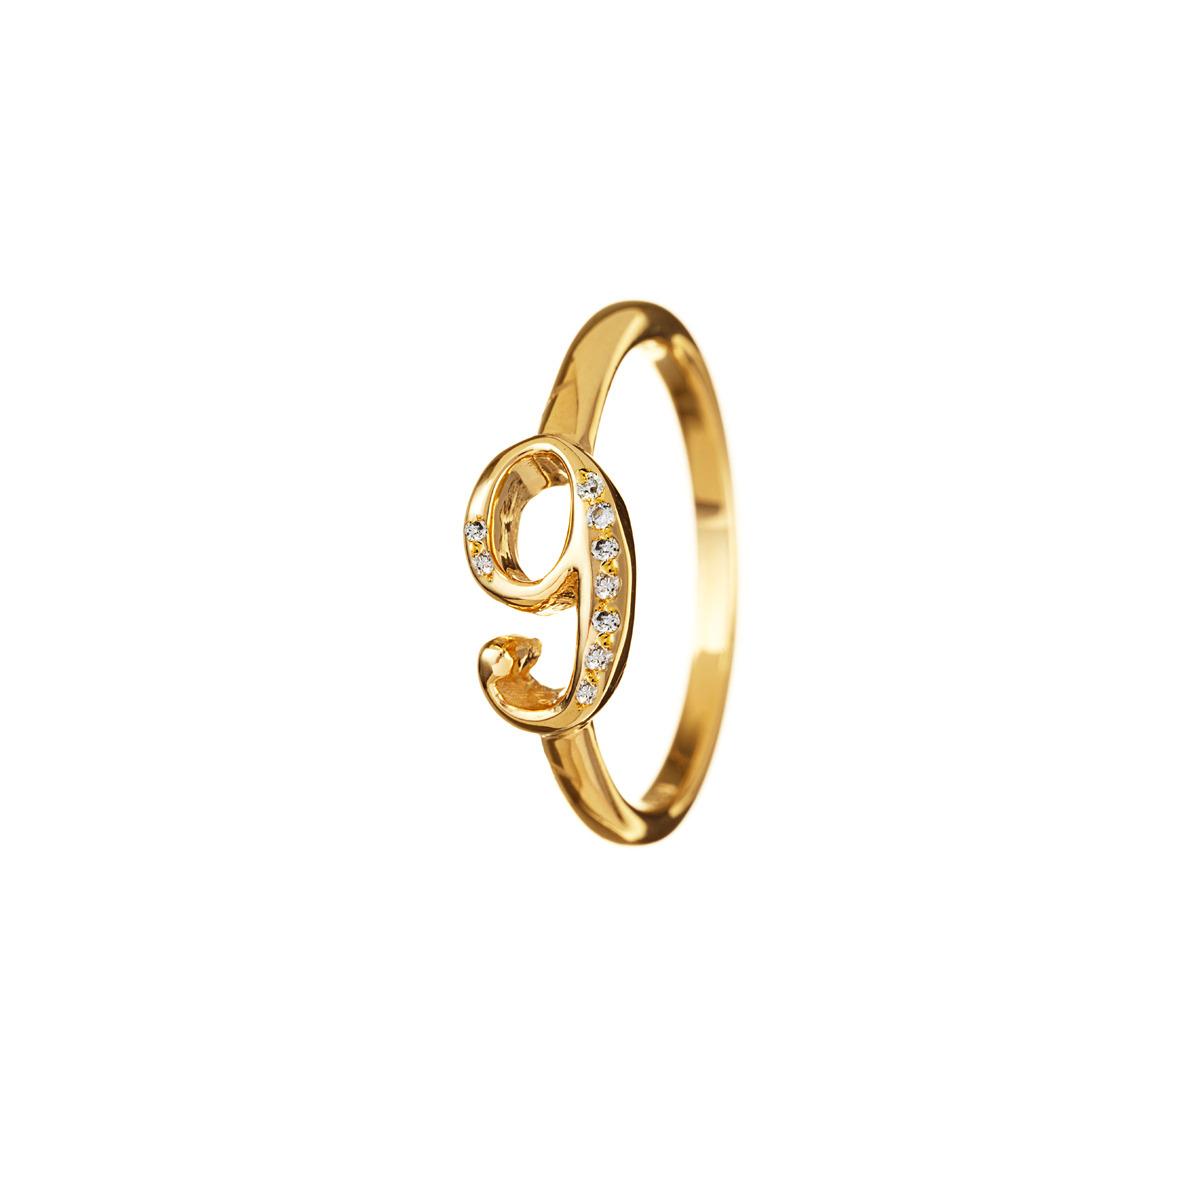 Lyst  Lulu Frost Code Number 18kt 9 Ring in Metallic